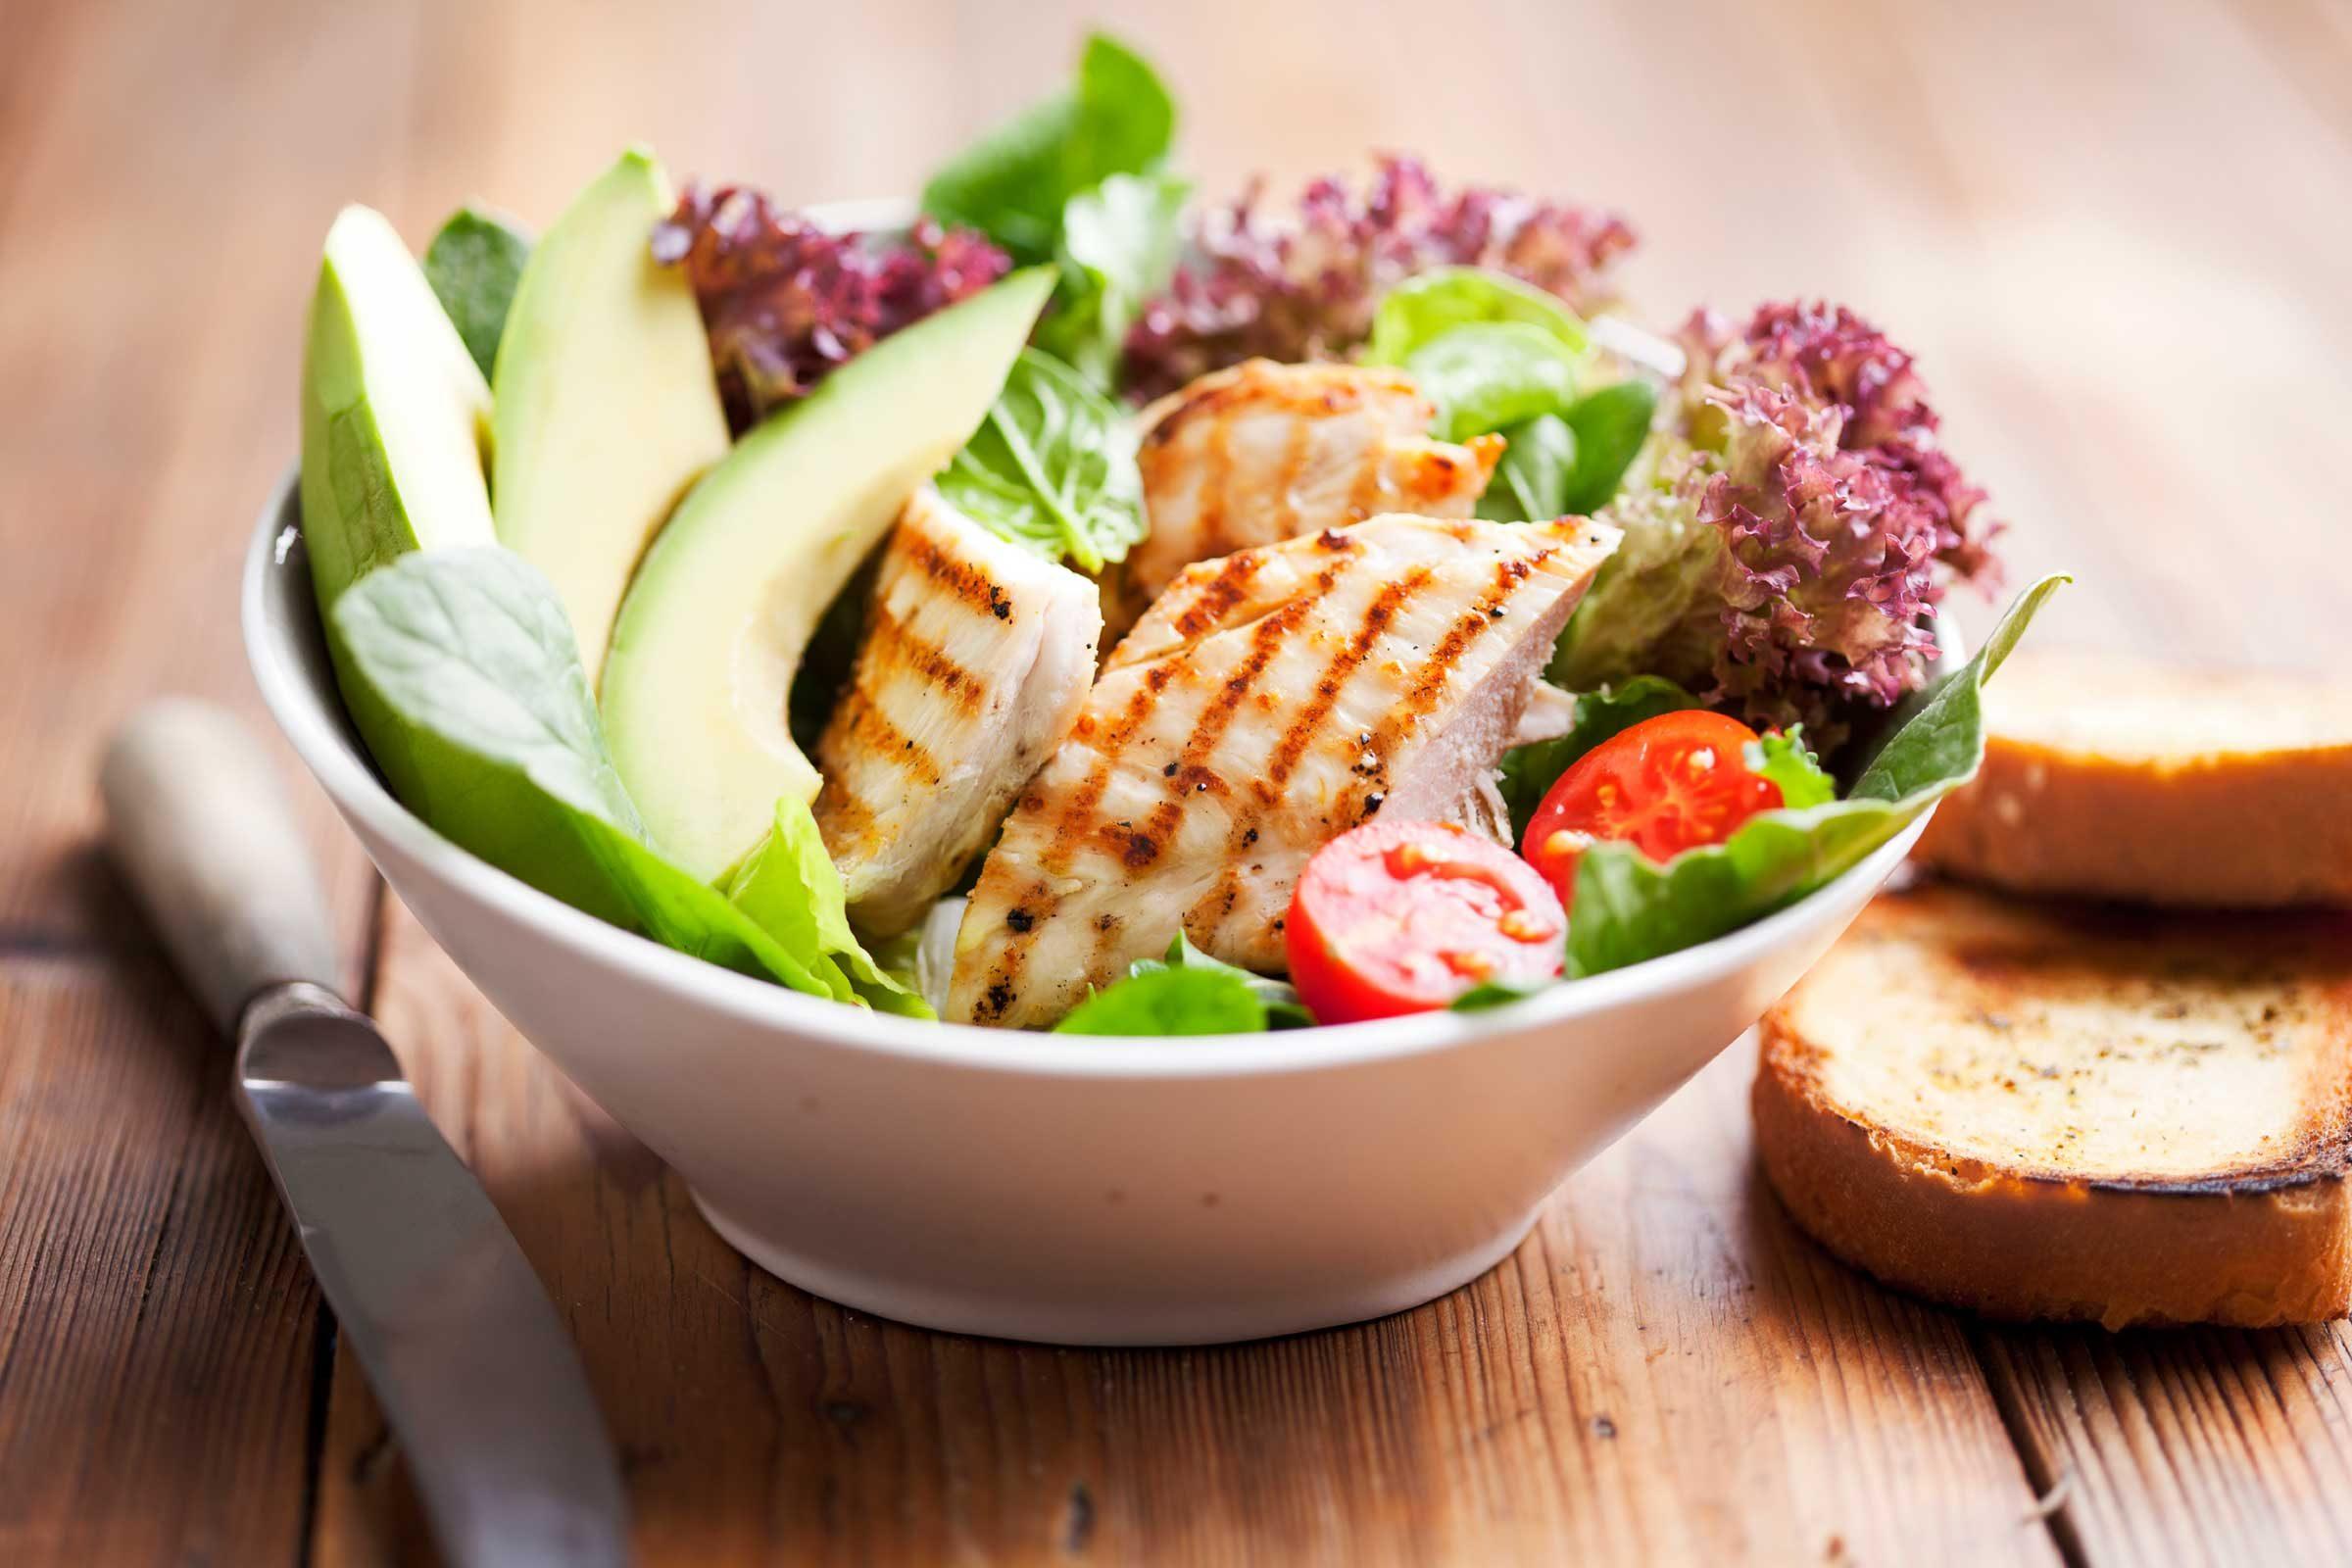 Add avocado to salads